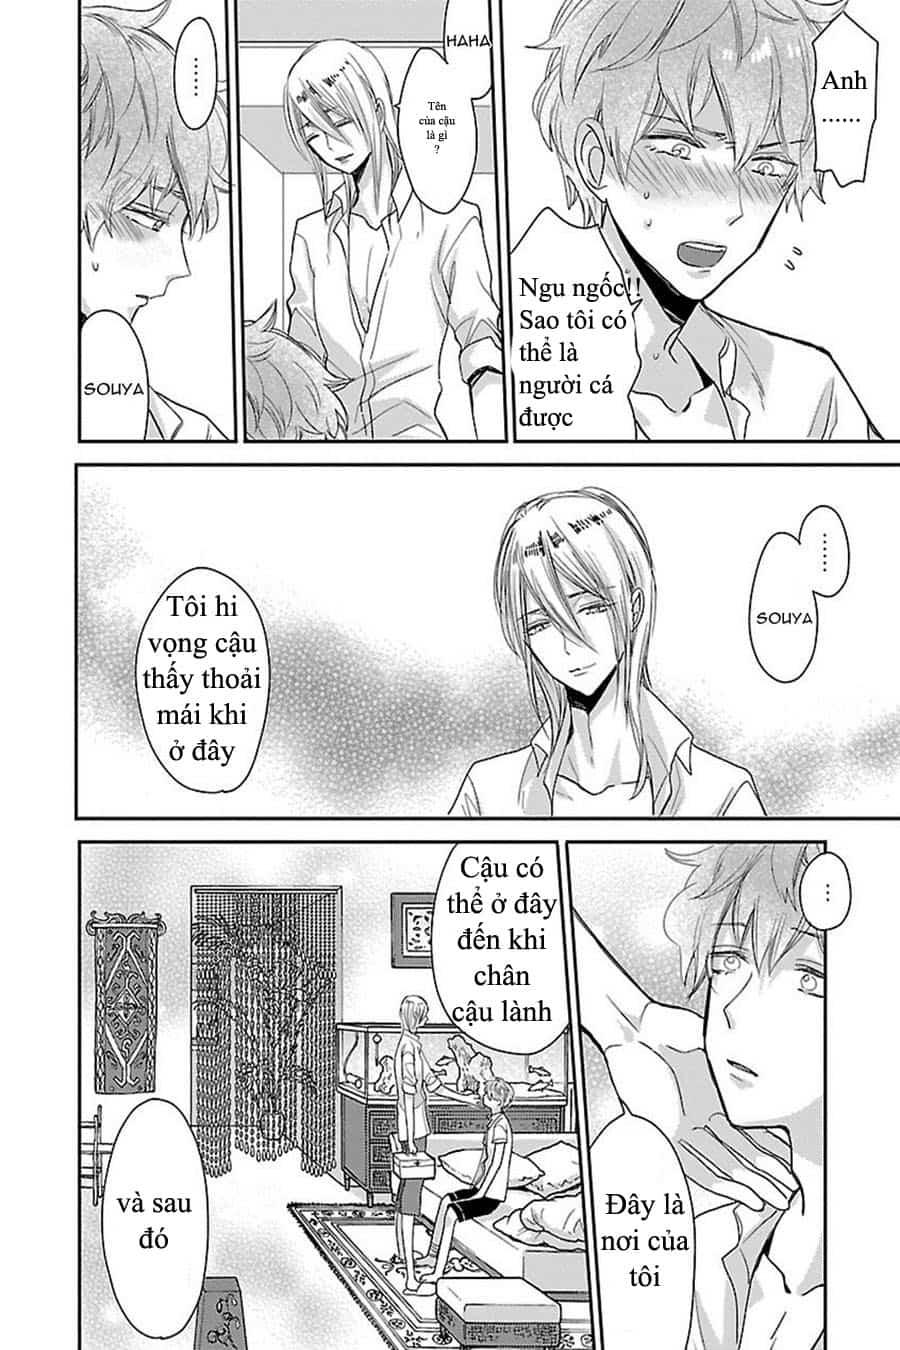 Trang 7 - [NANABISHI Hiro] Rendezvouz (- NANABISHI Hiro) - Truyện tranh Gay - Server HostedOnGoogleServerStaging